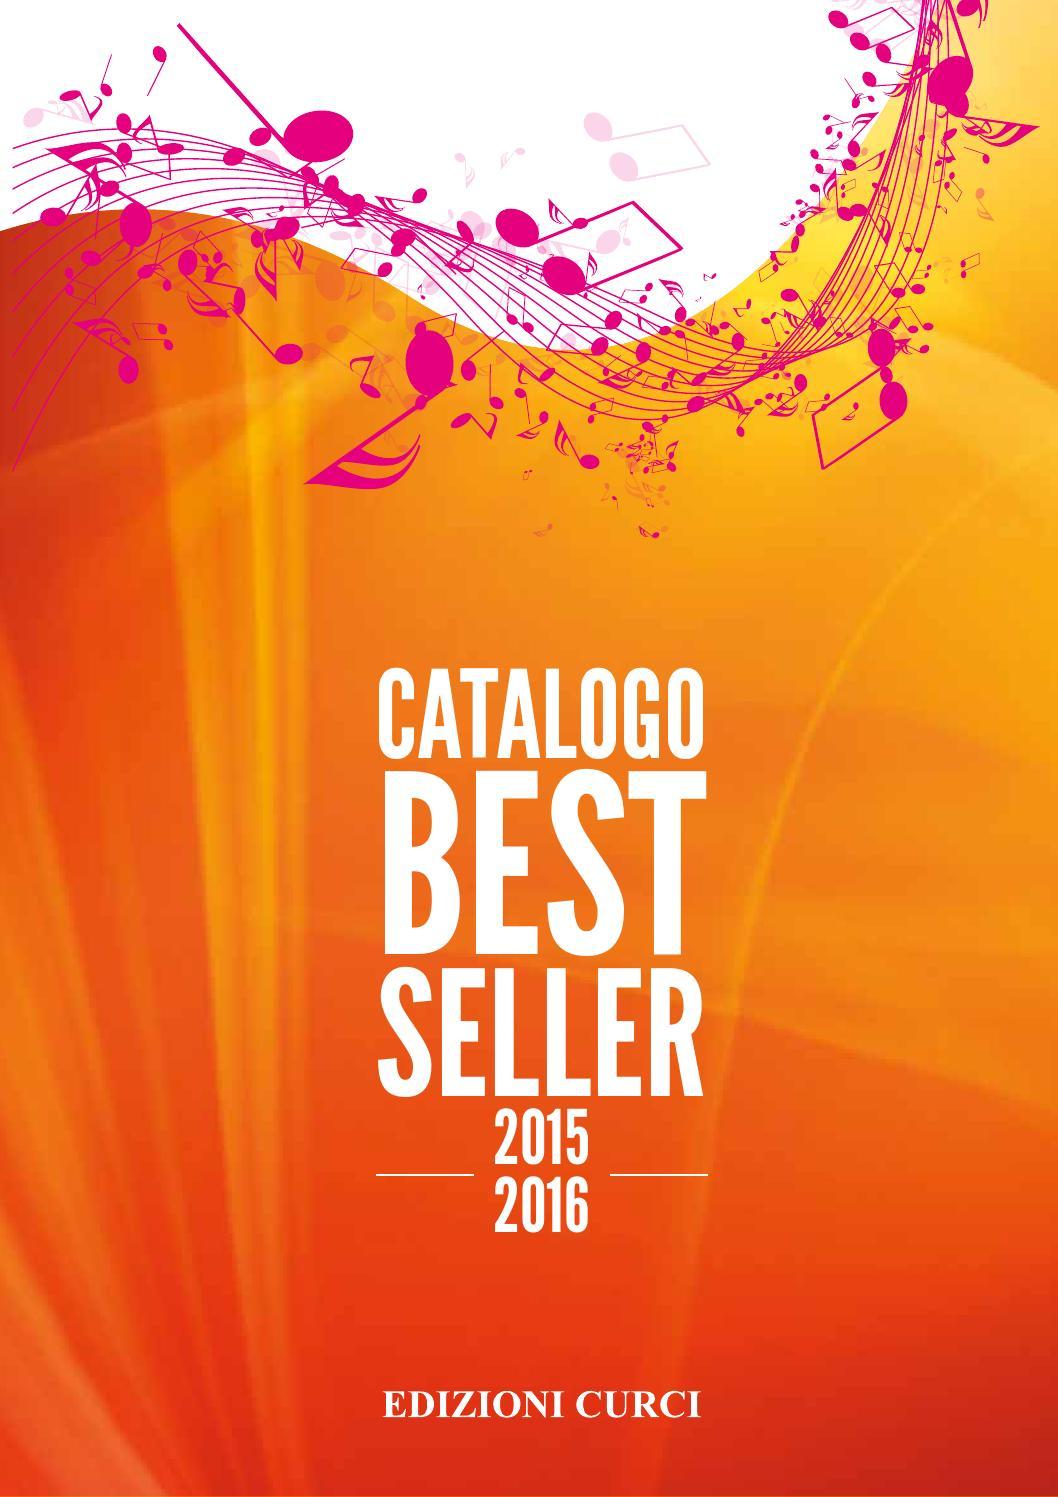 ec best seller 2015 2016 by edizioni curci issuu. Black Bedroom Furniture Sets. Home Design Ideas